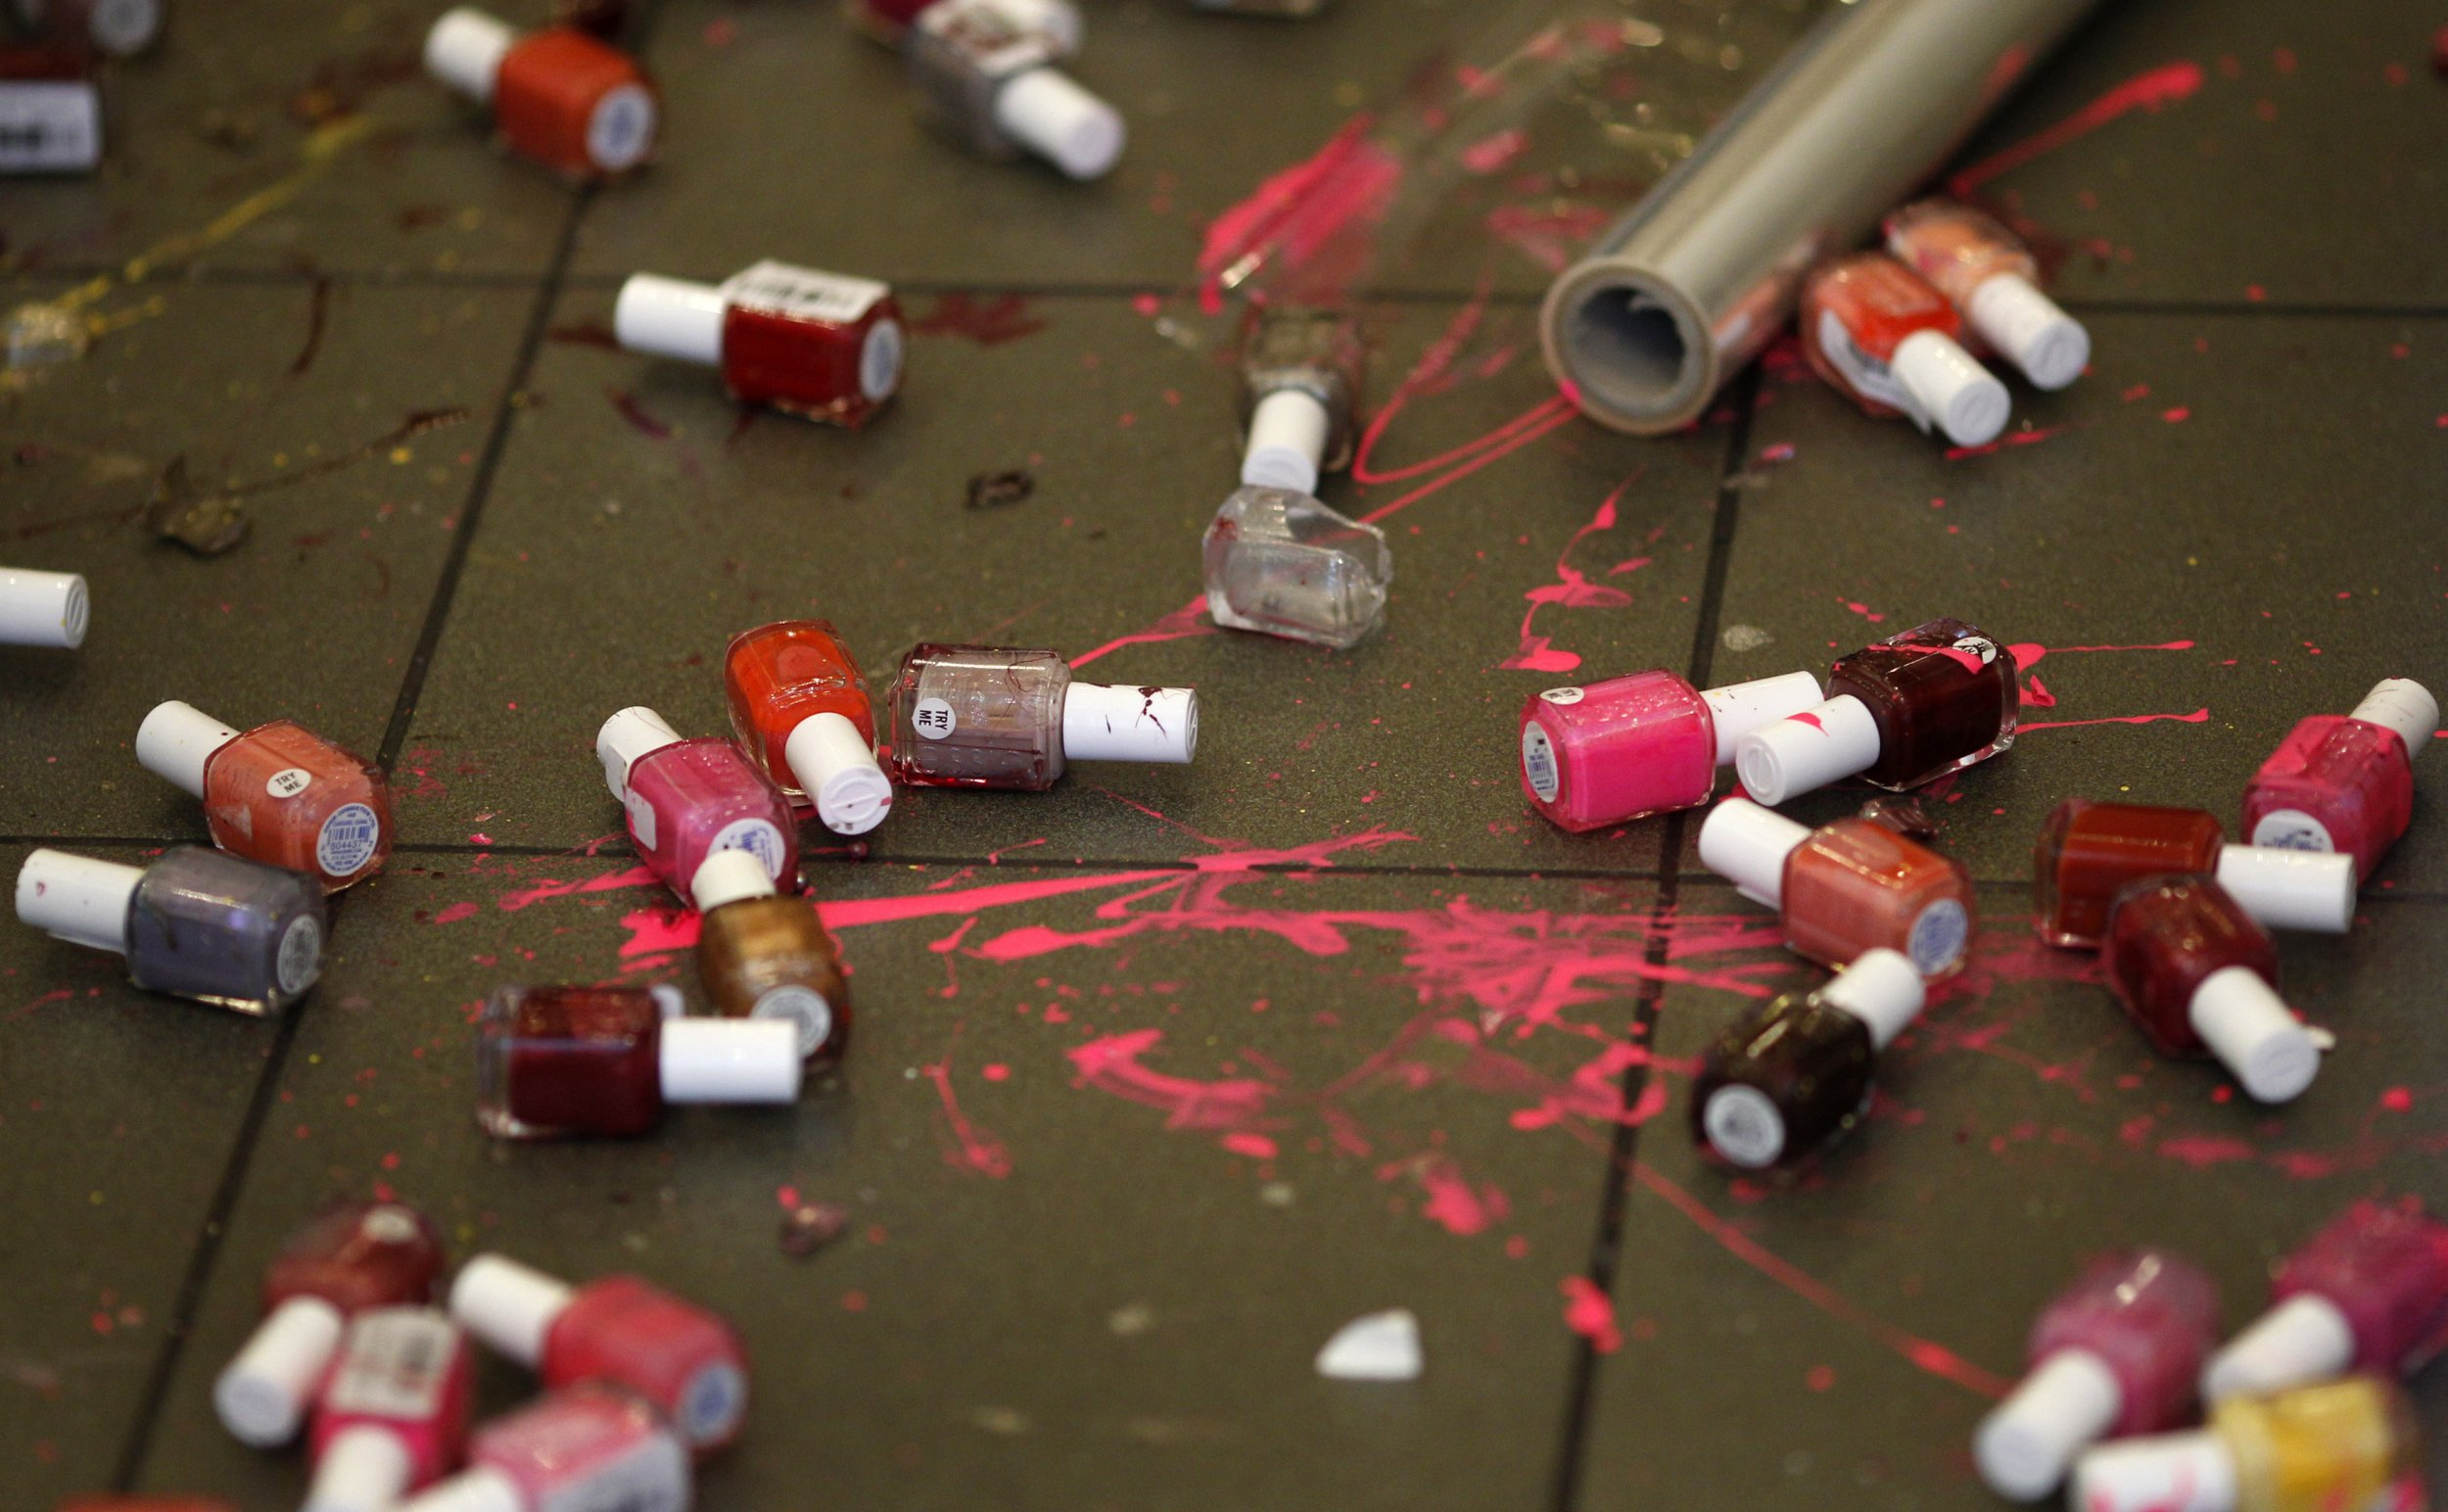 5-11-15 Nail polish spilled